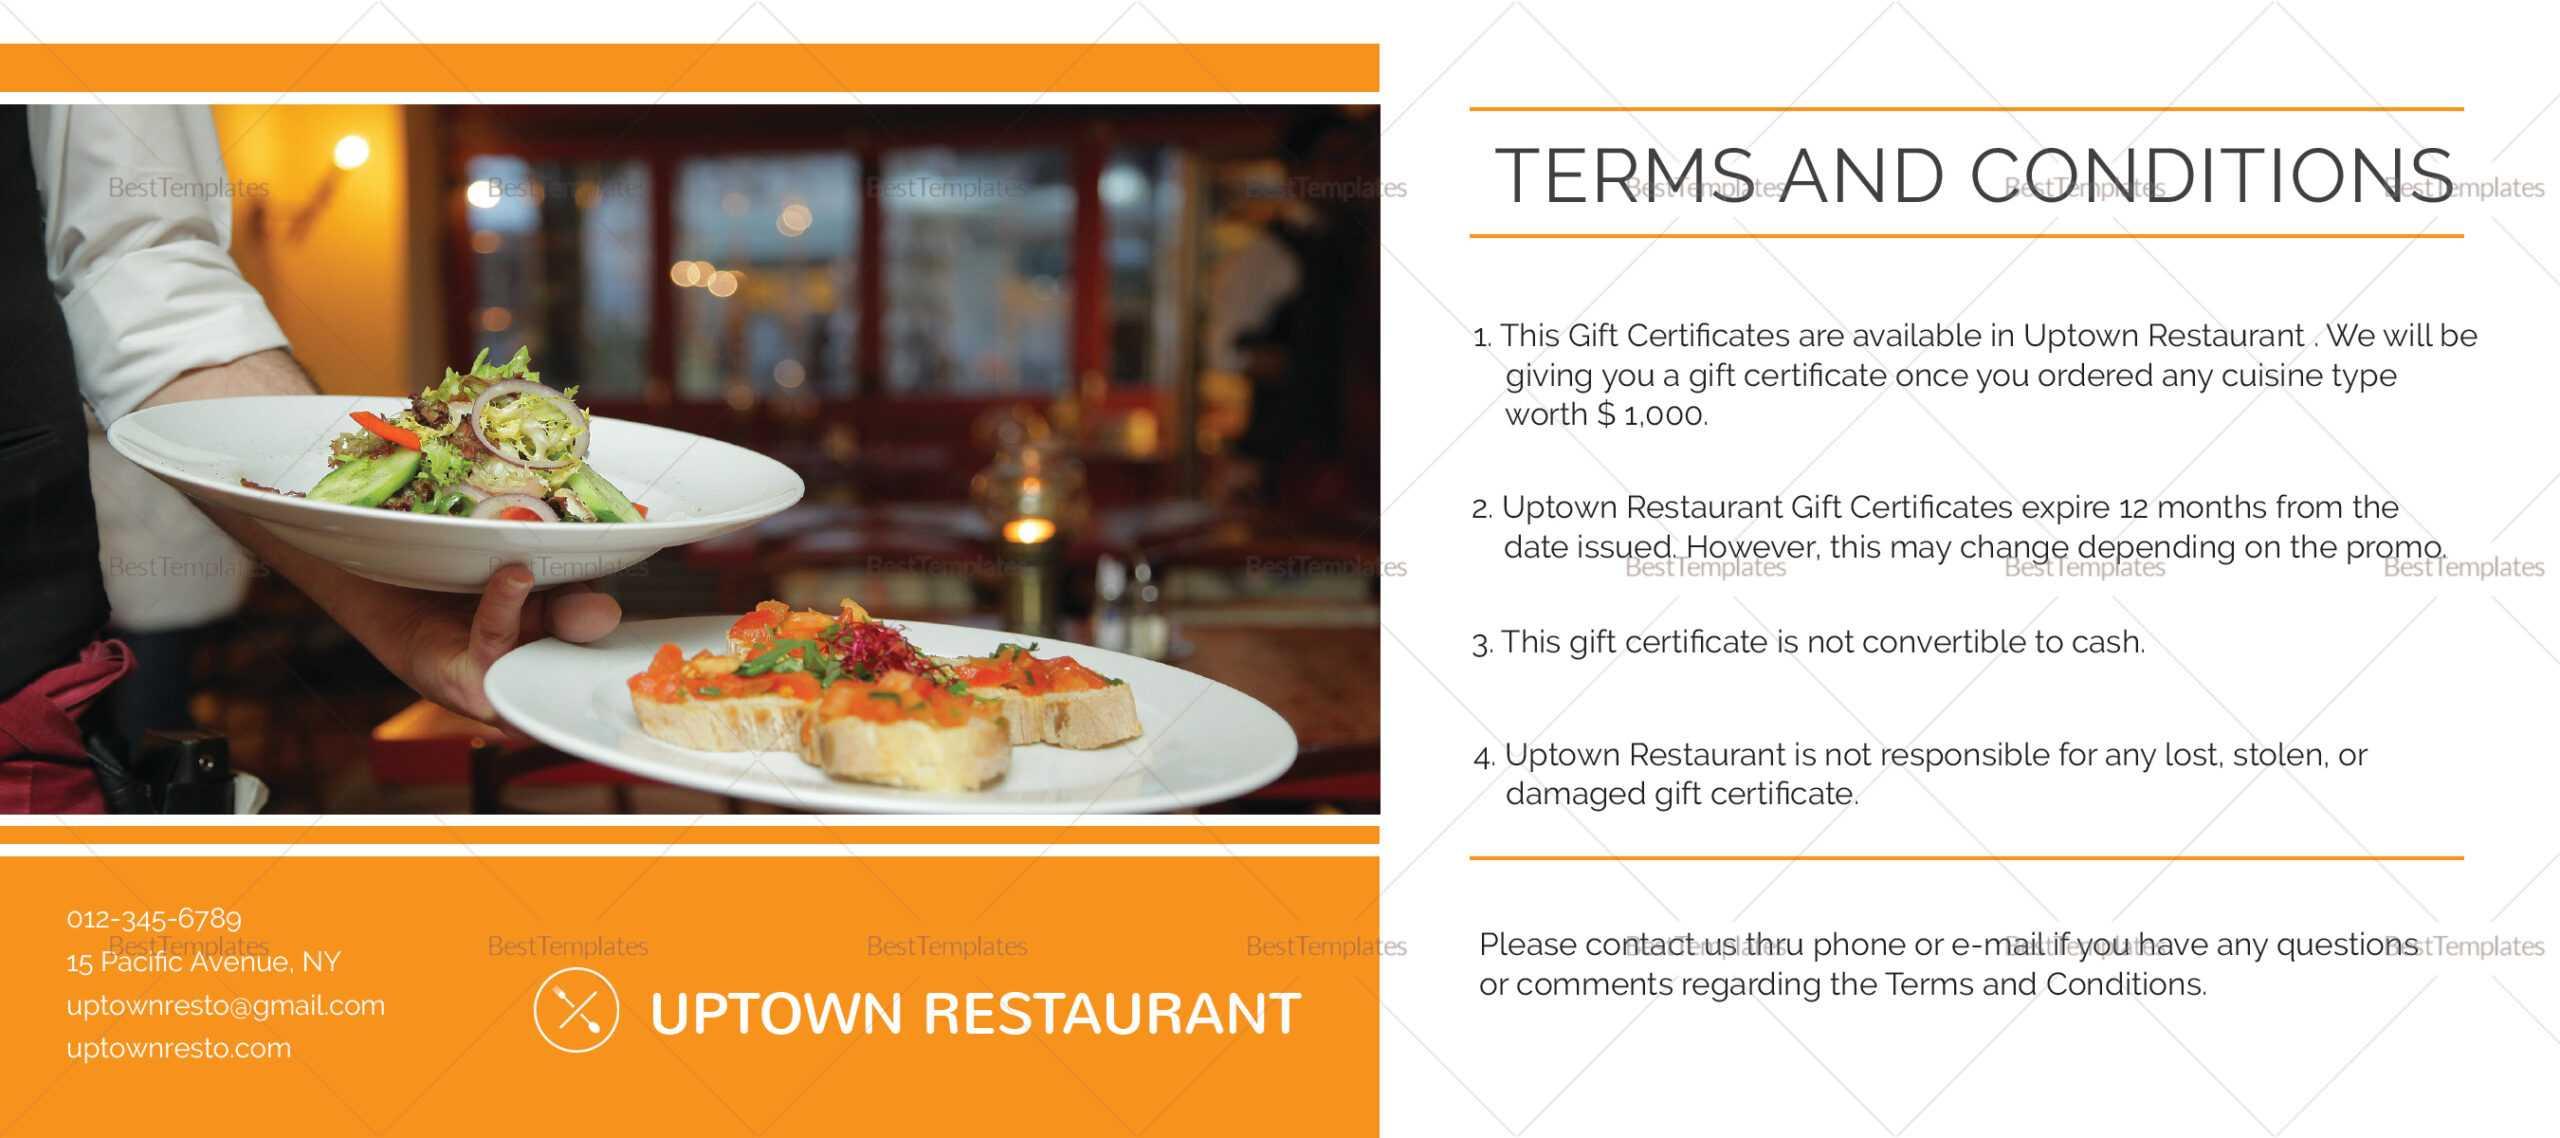 Restaurant Gift Certificate Template Inside Restaurant Gift Certificate Template